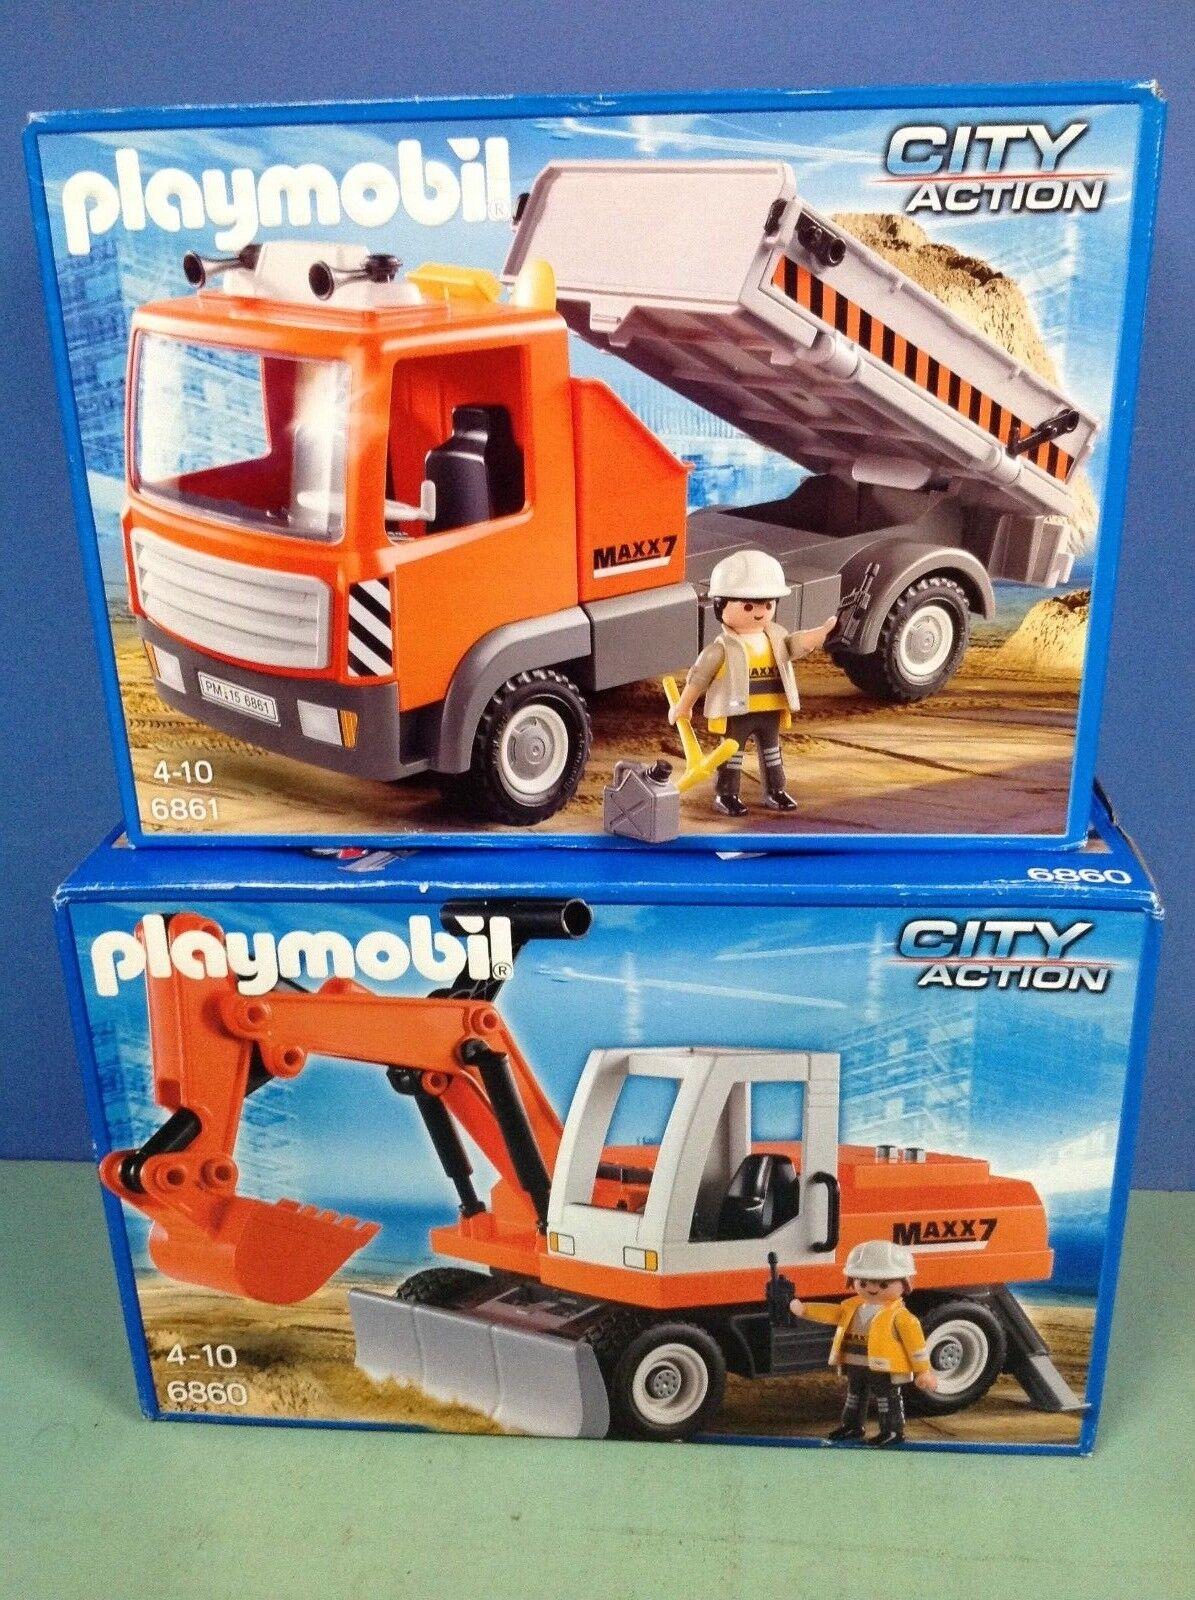 O6860.5  playmobil ensemble véhicules chantier maxx7 boites 6860 + 6861 cplt